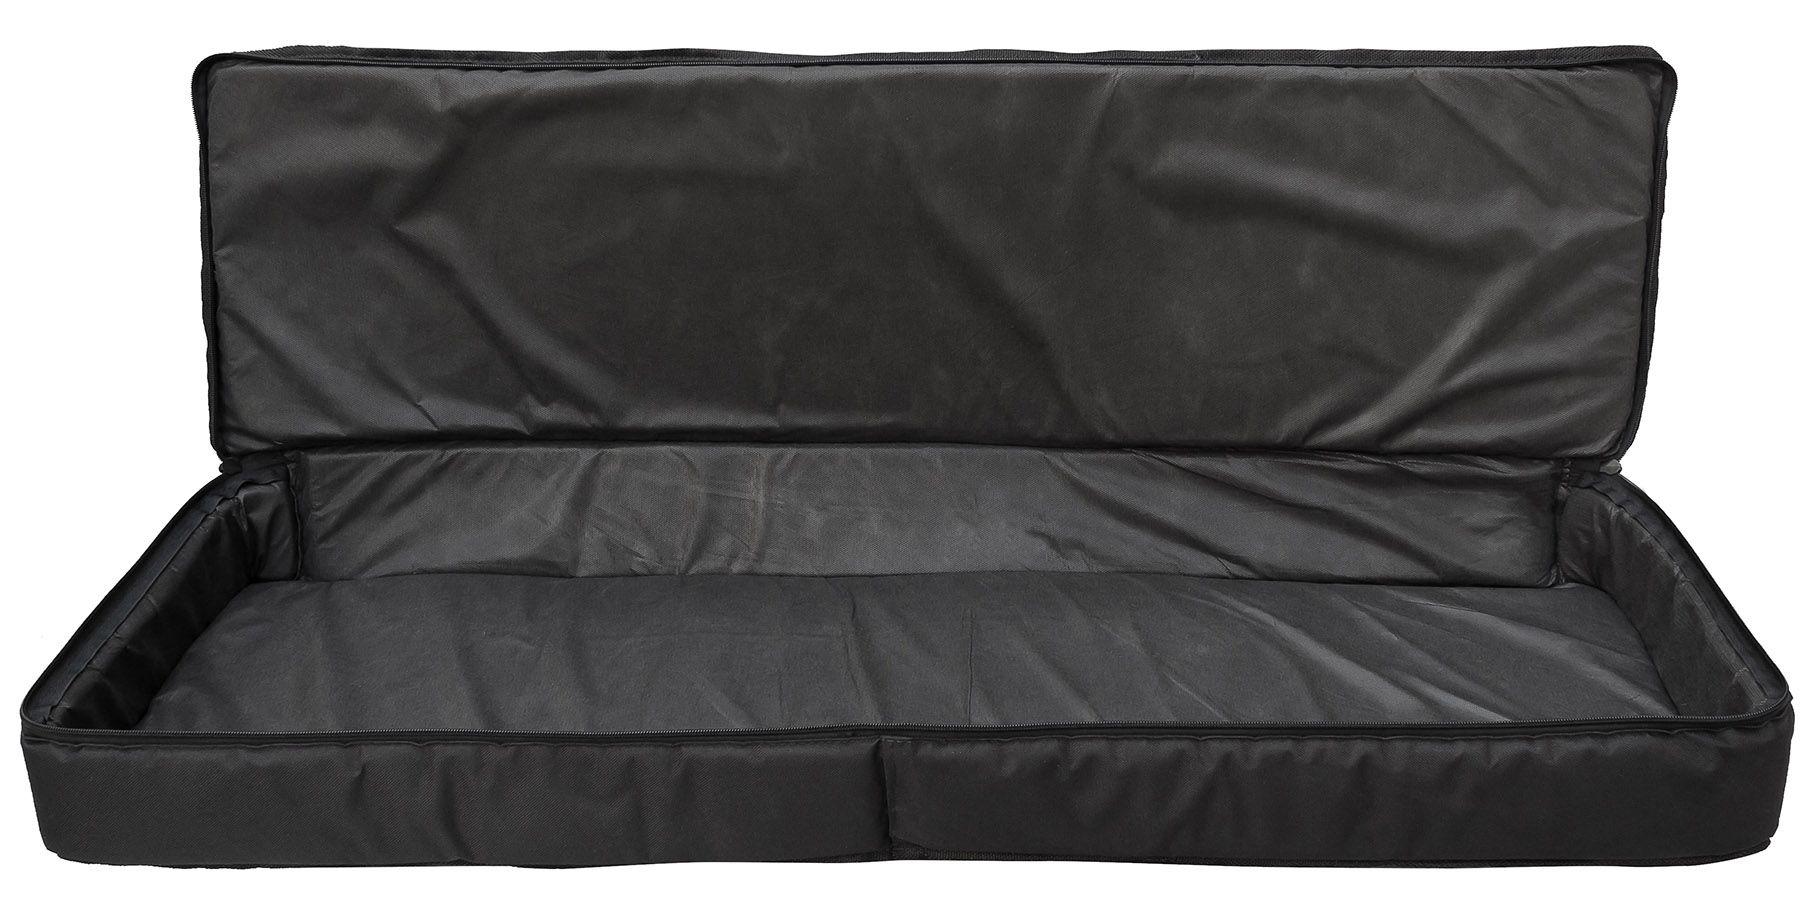 Capa Teclado Soft Case Start 5/8 G Almofadada - Preto